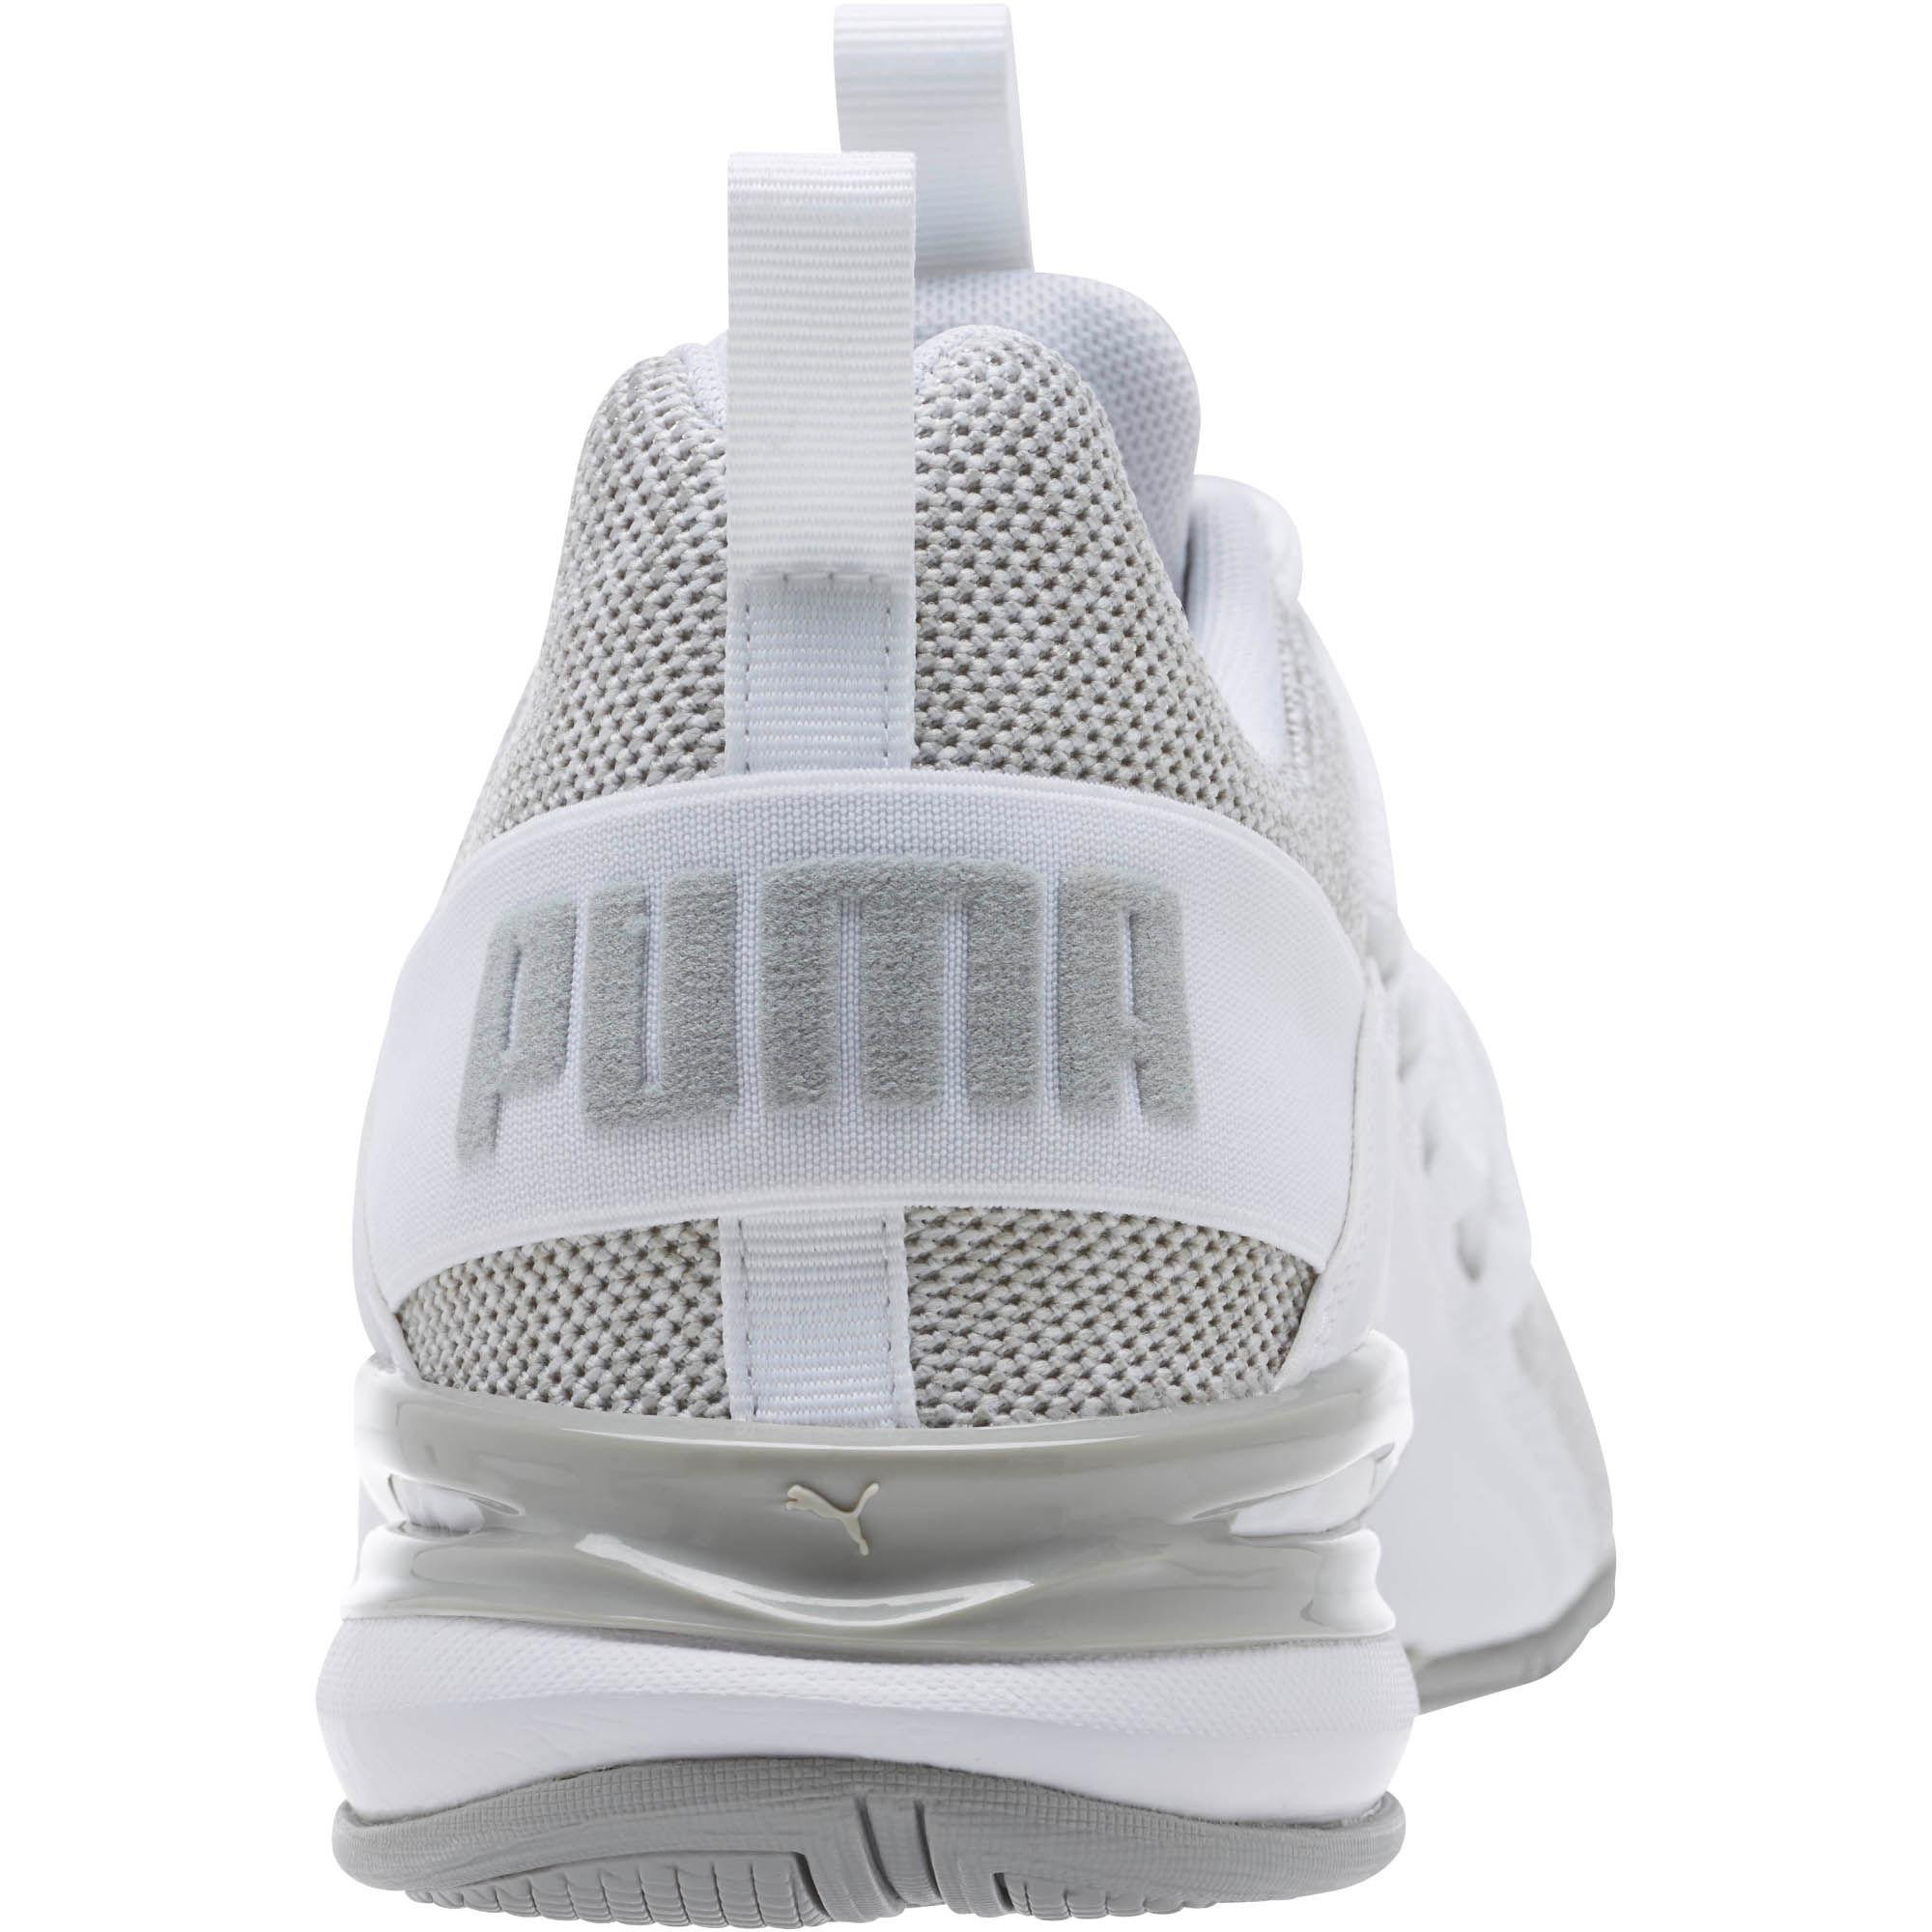 48ccfe72b499 ... popular brand 6822f 30132 PUMA - Multicolor Axelion Mens Sneakers for  Men - Lyst.